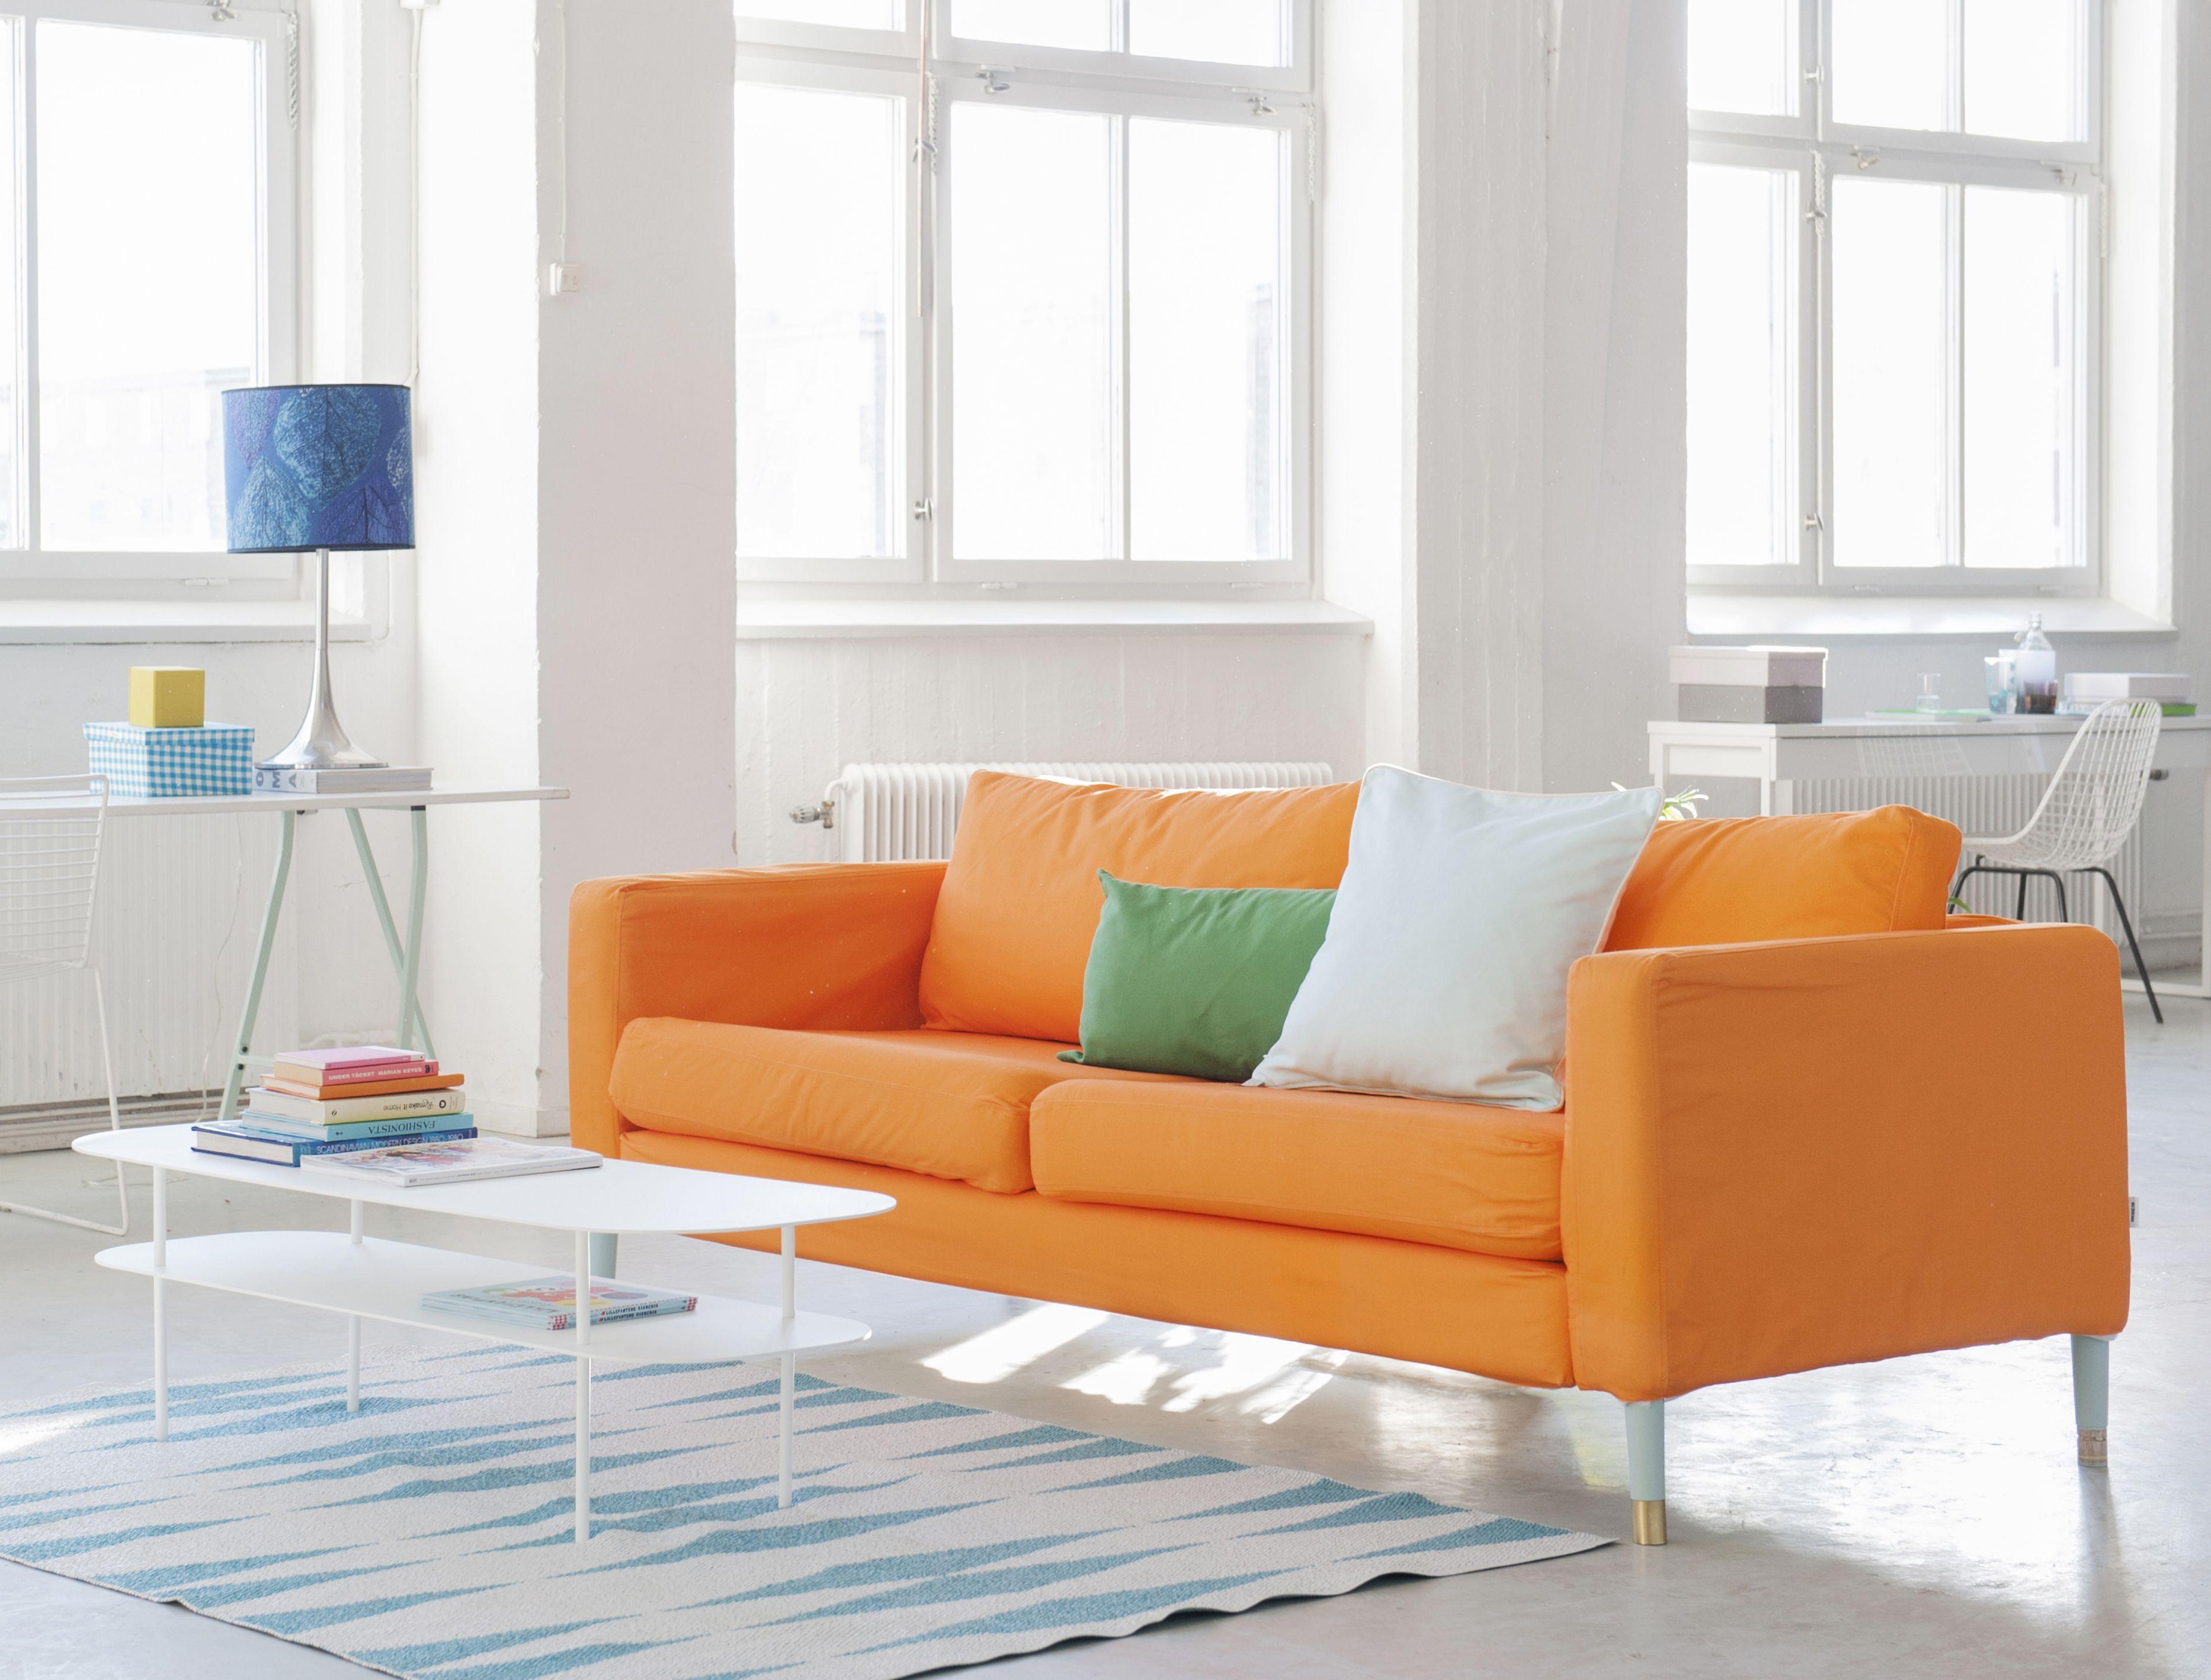 Karlstad 3 Seater Sofa Cover Loose Fit Orange